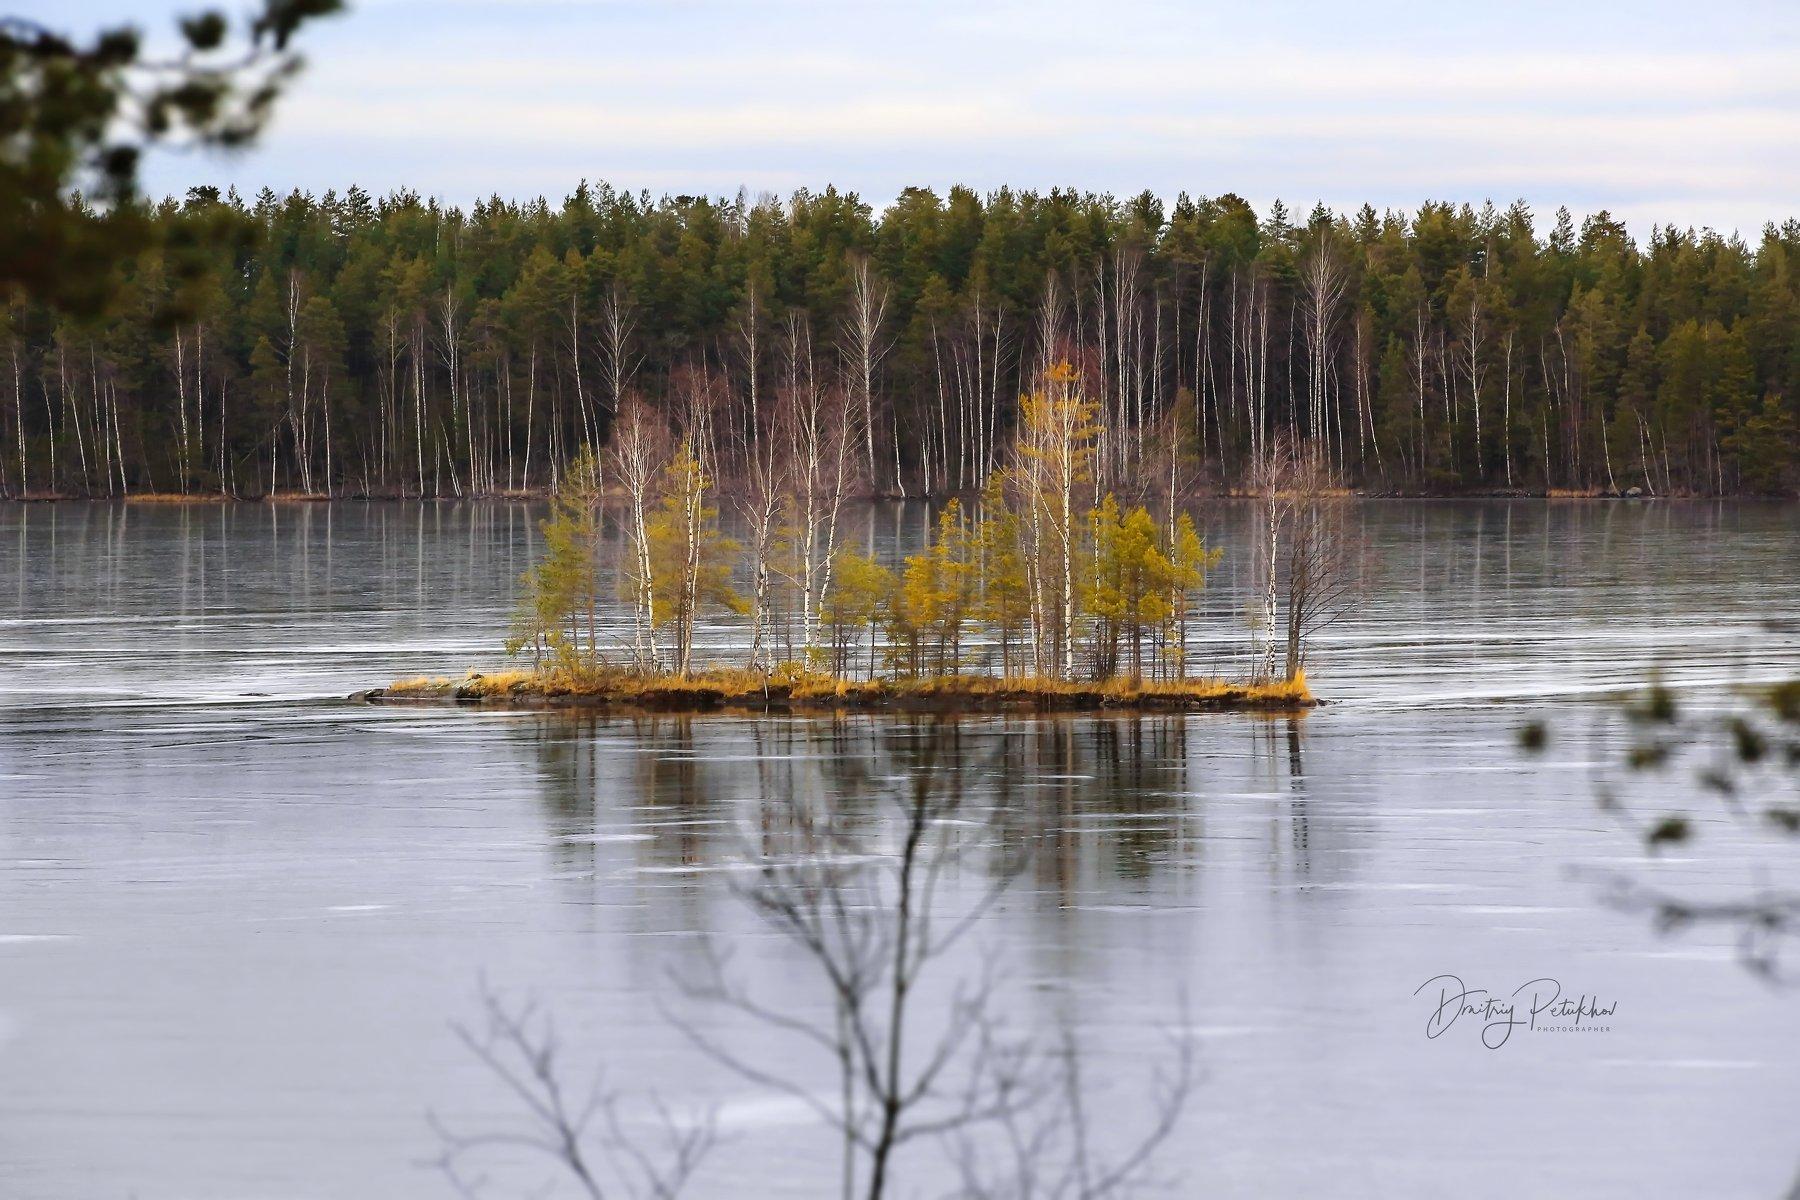 зима, карелия, пейзаж, природа, озеро, Петухов Дмитрий